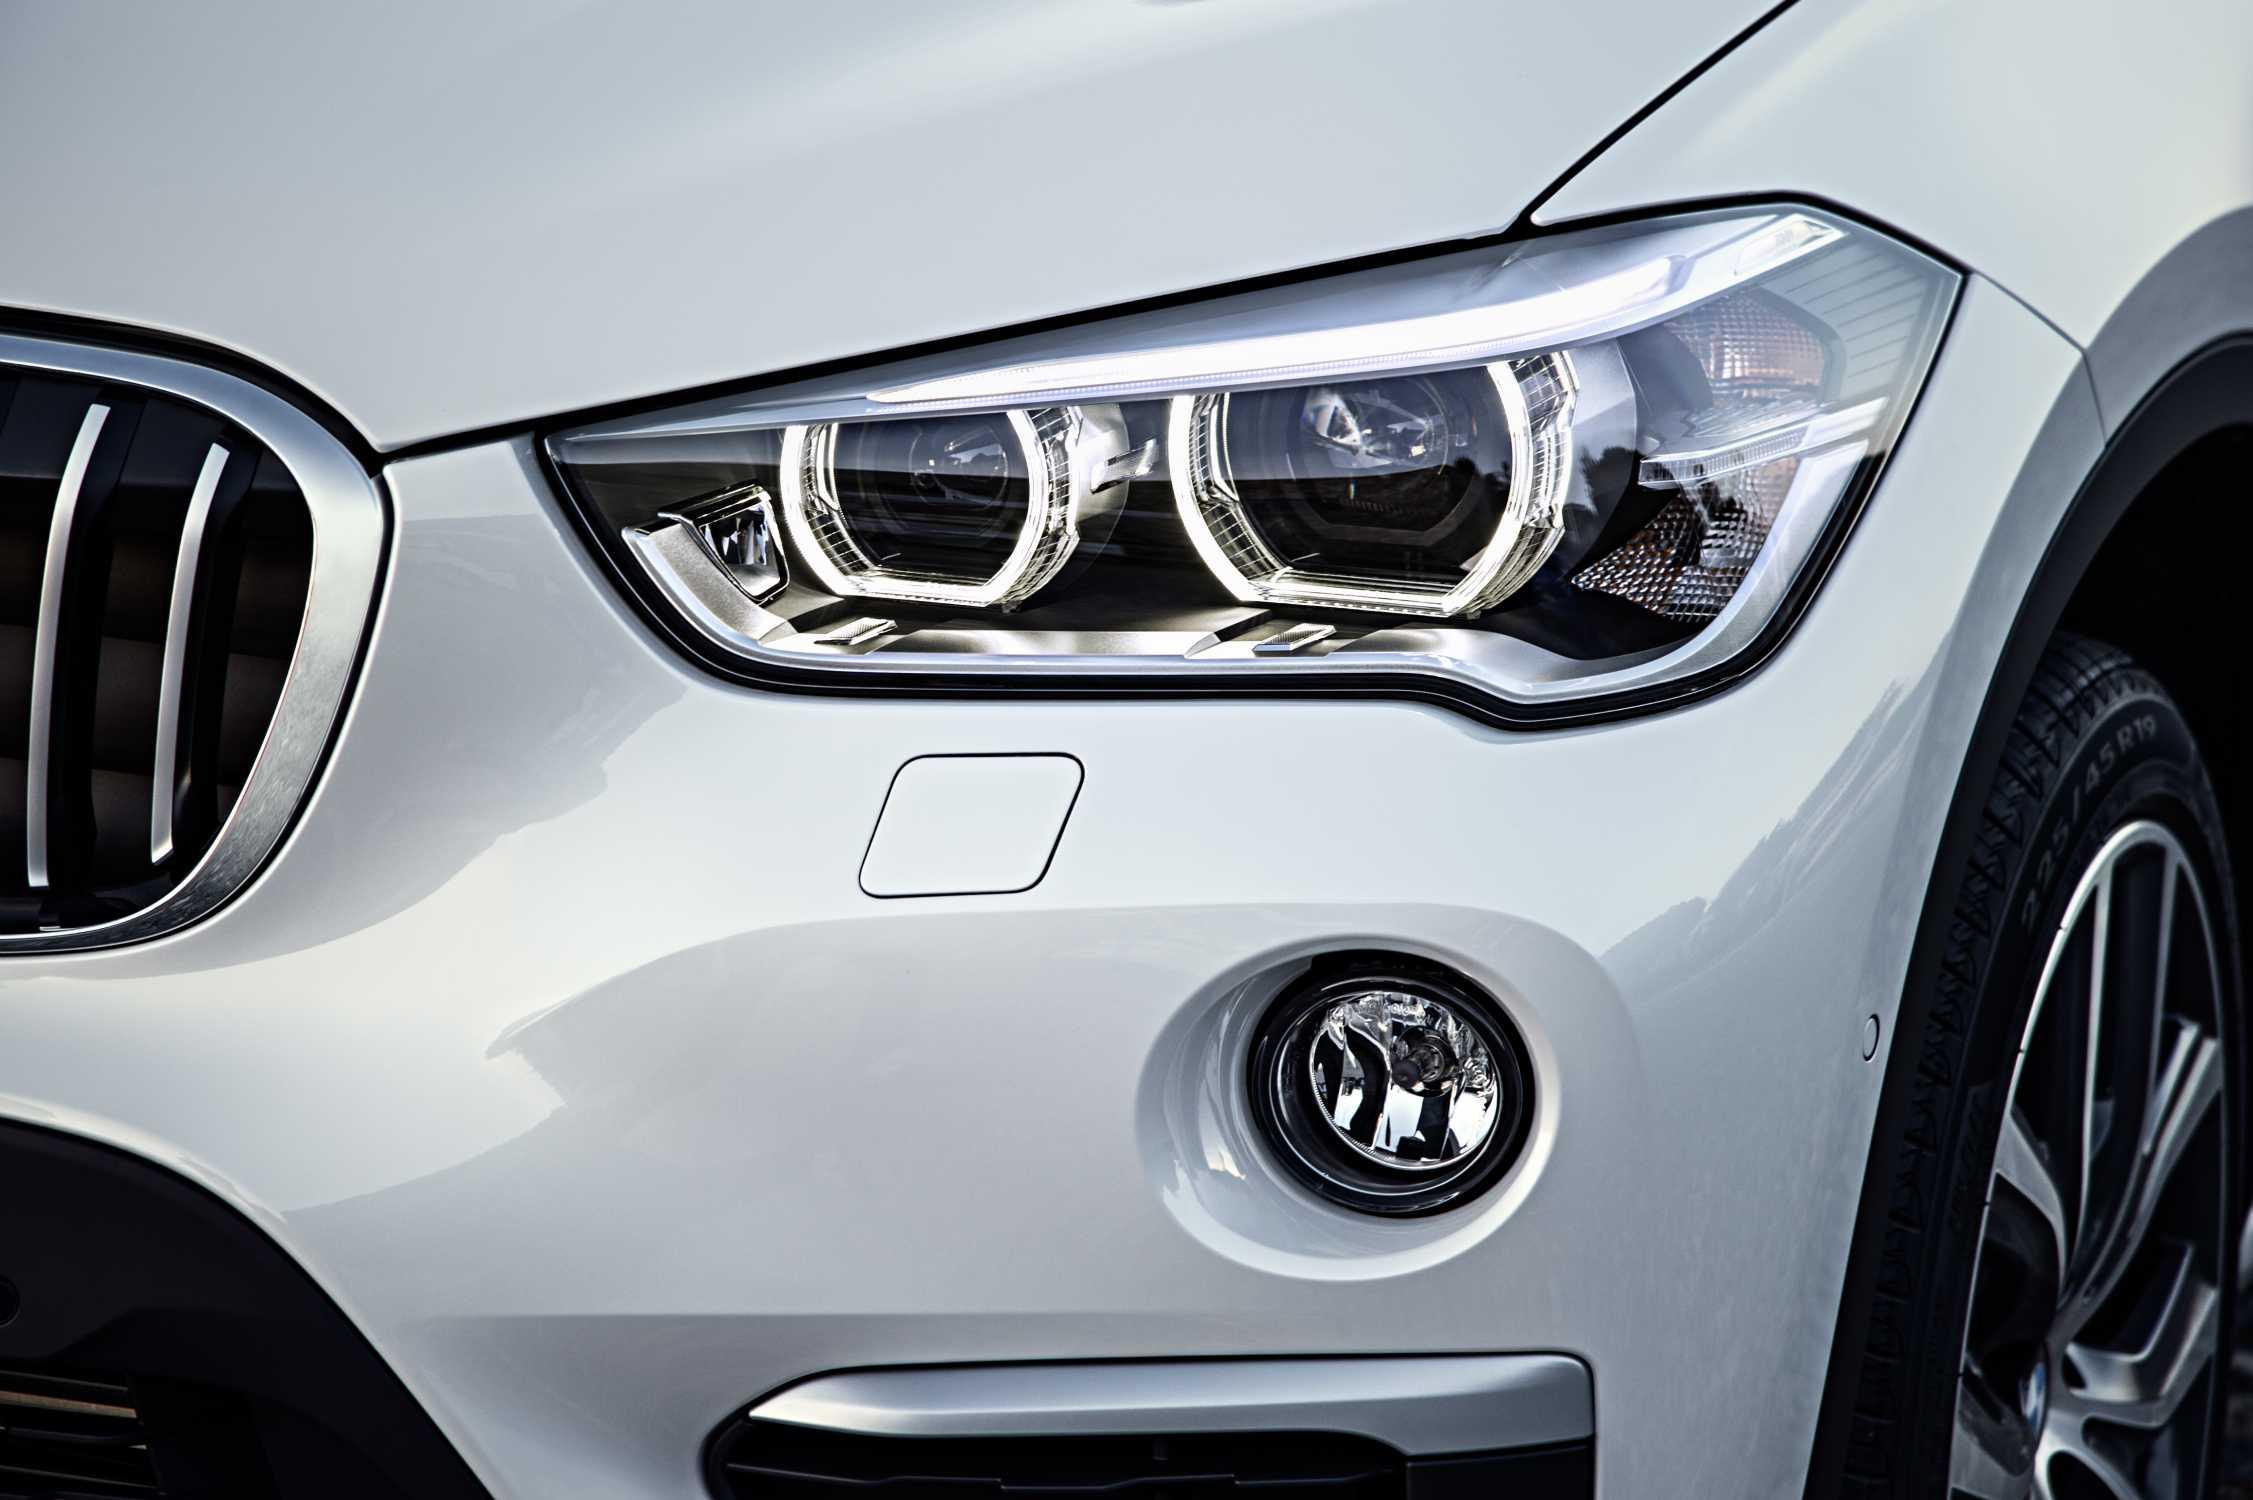 The New Bmw X1 Xline Mineral White Metallic Light